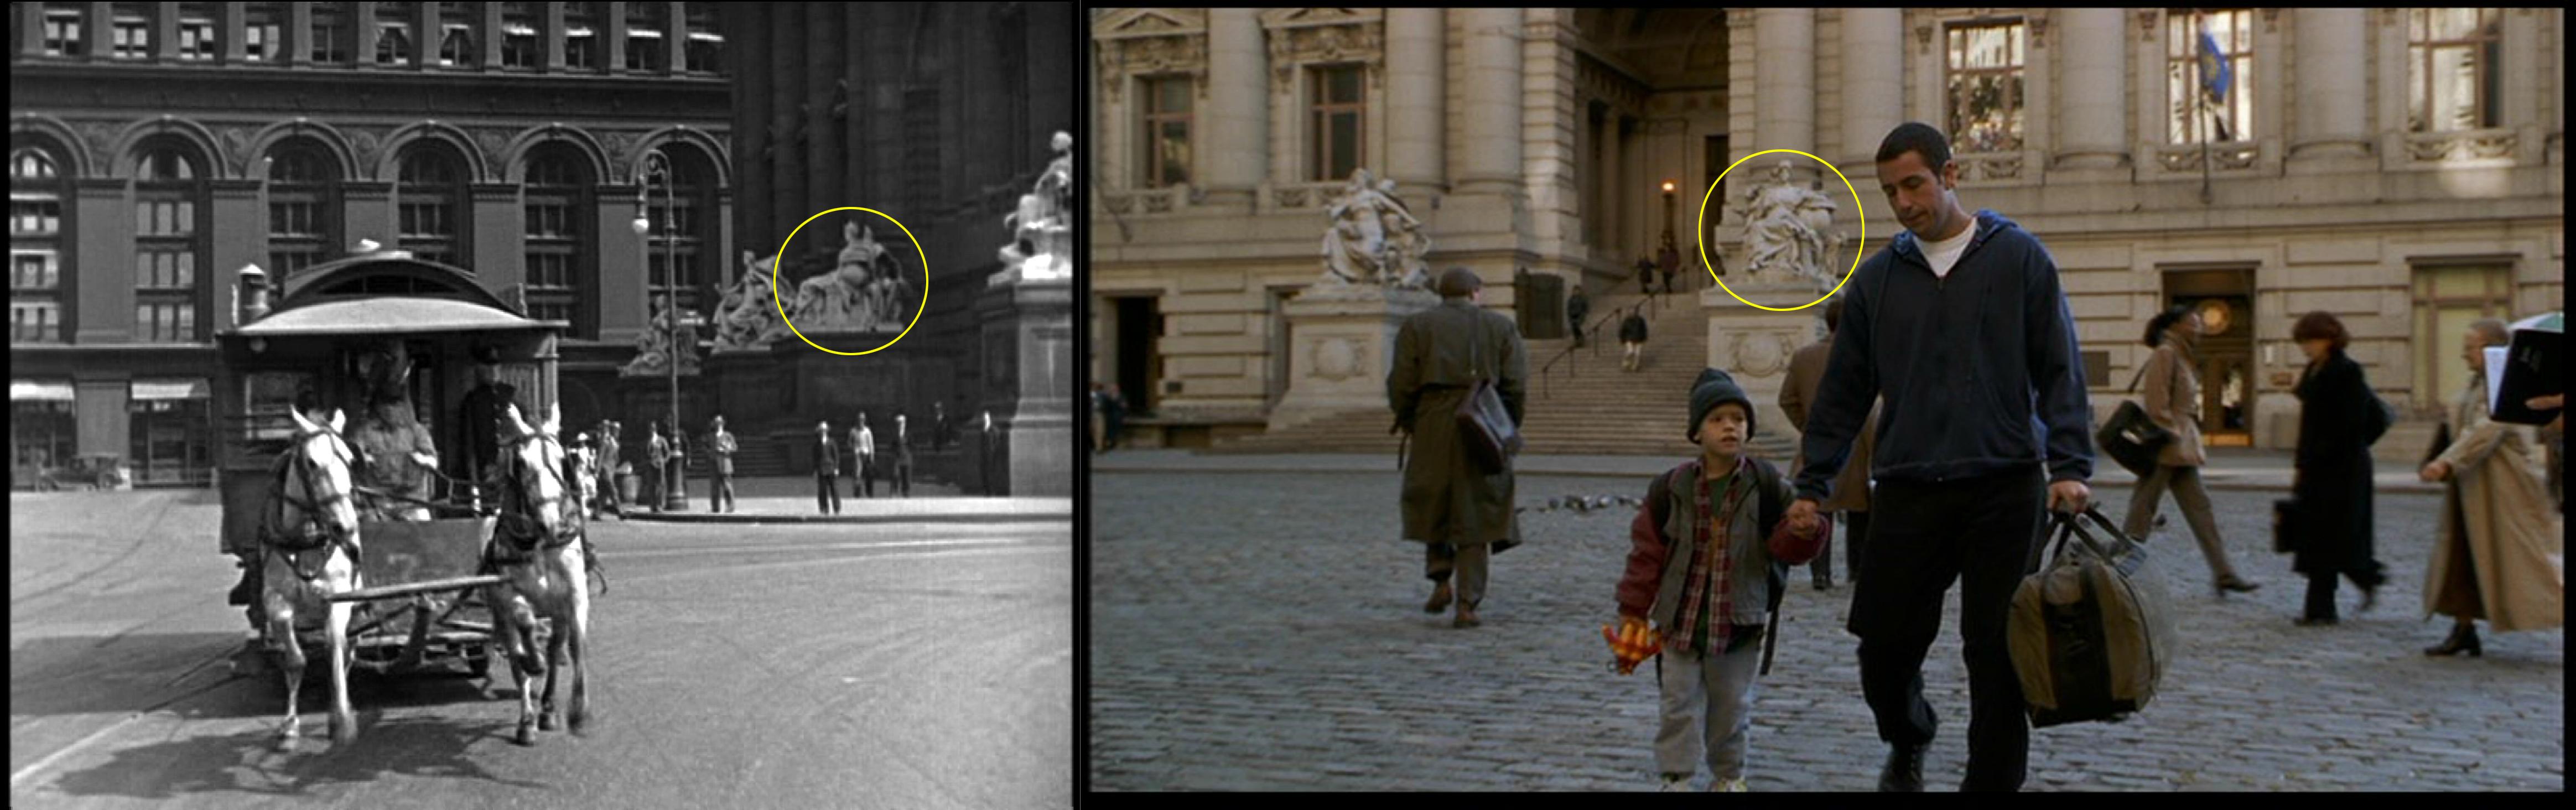 New York, Harold Lloyd, and Adam Sandler?! | Chaplin ...